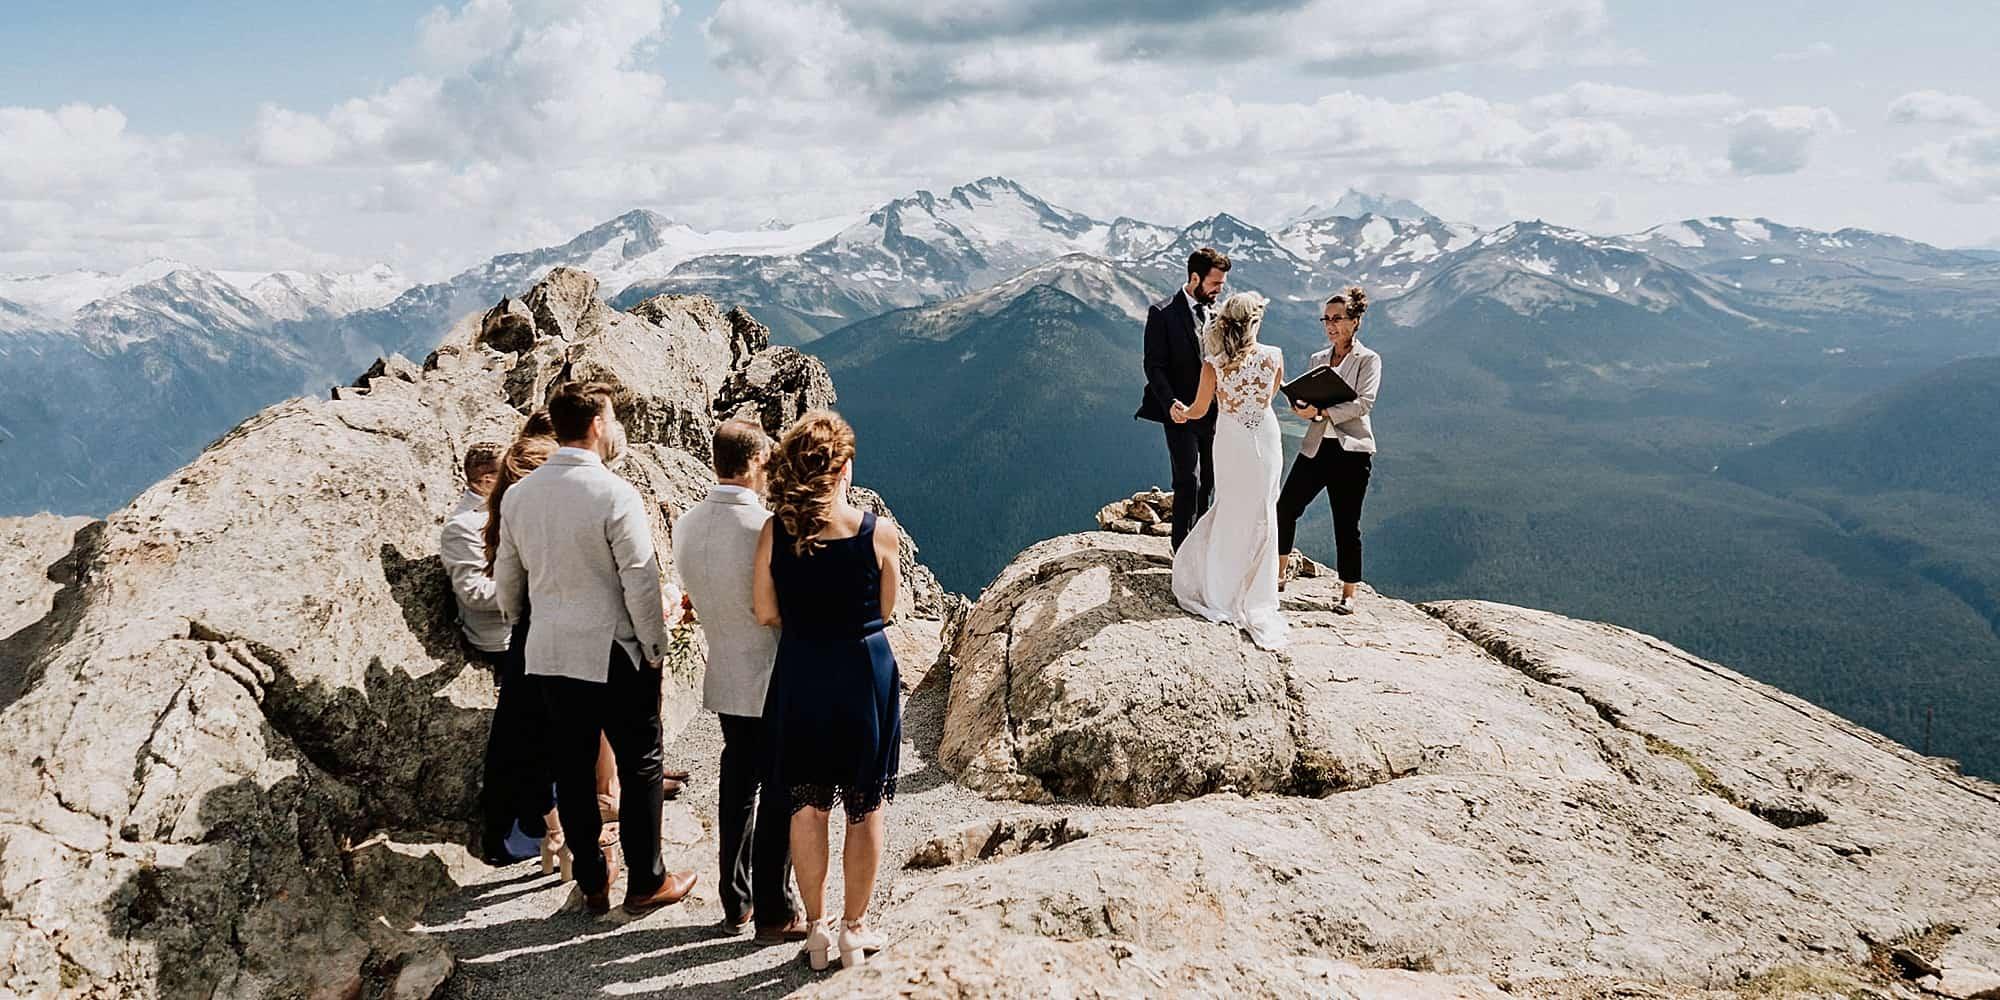 whistler-blackcomb-wedding-ceremony-location